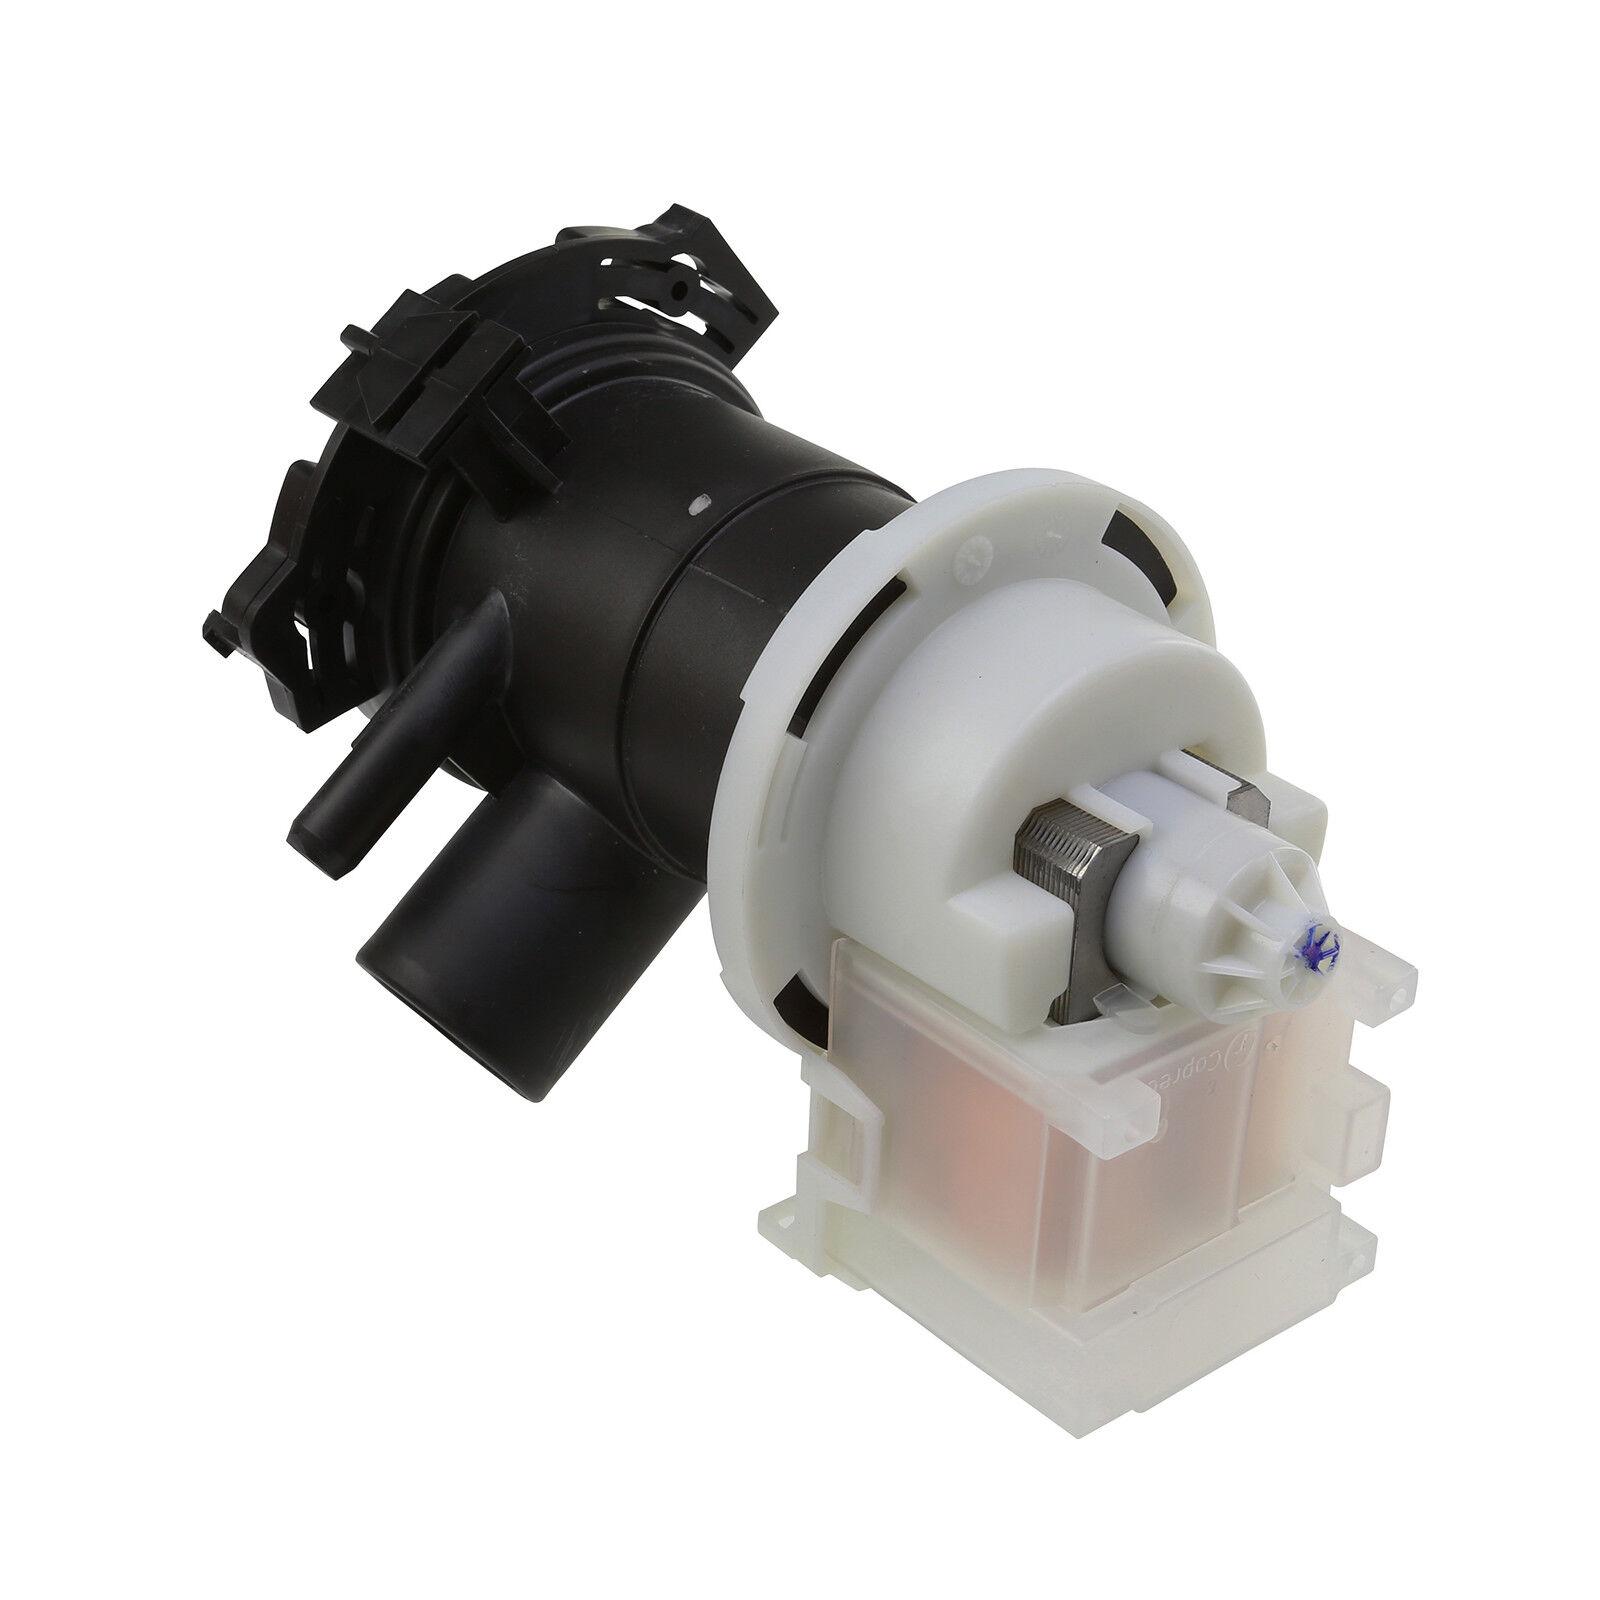 Bosch Machine À Laver Vidange Pompe 145212 genuine part